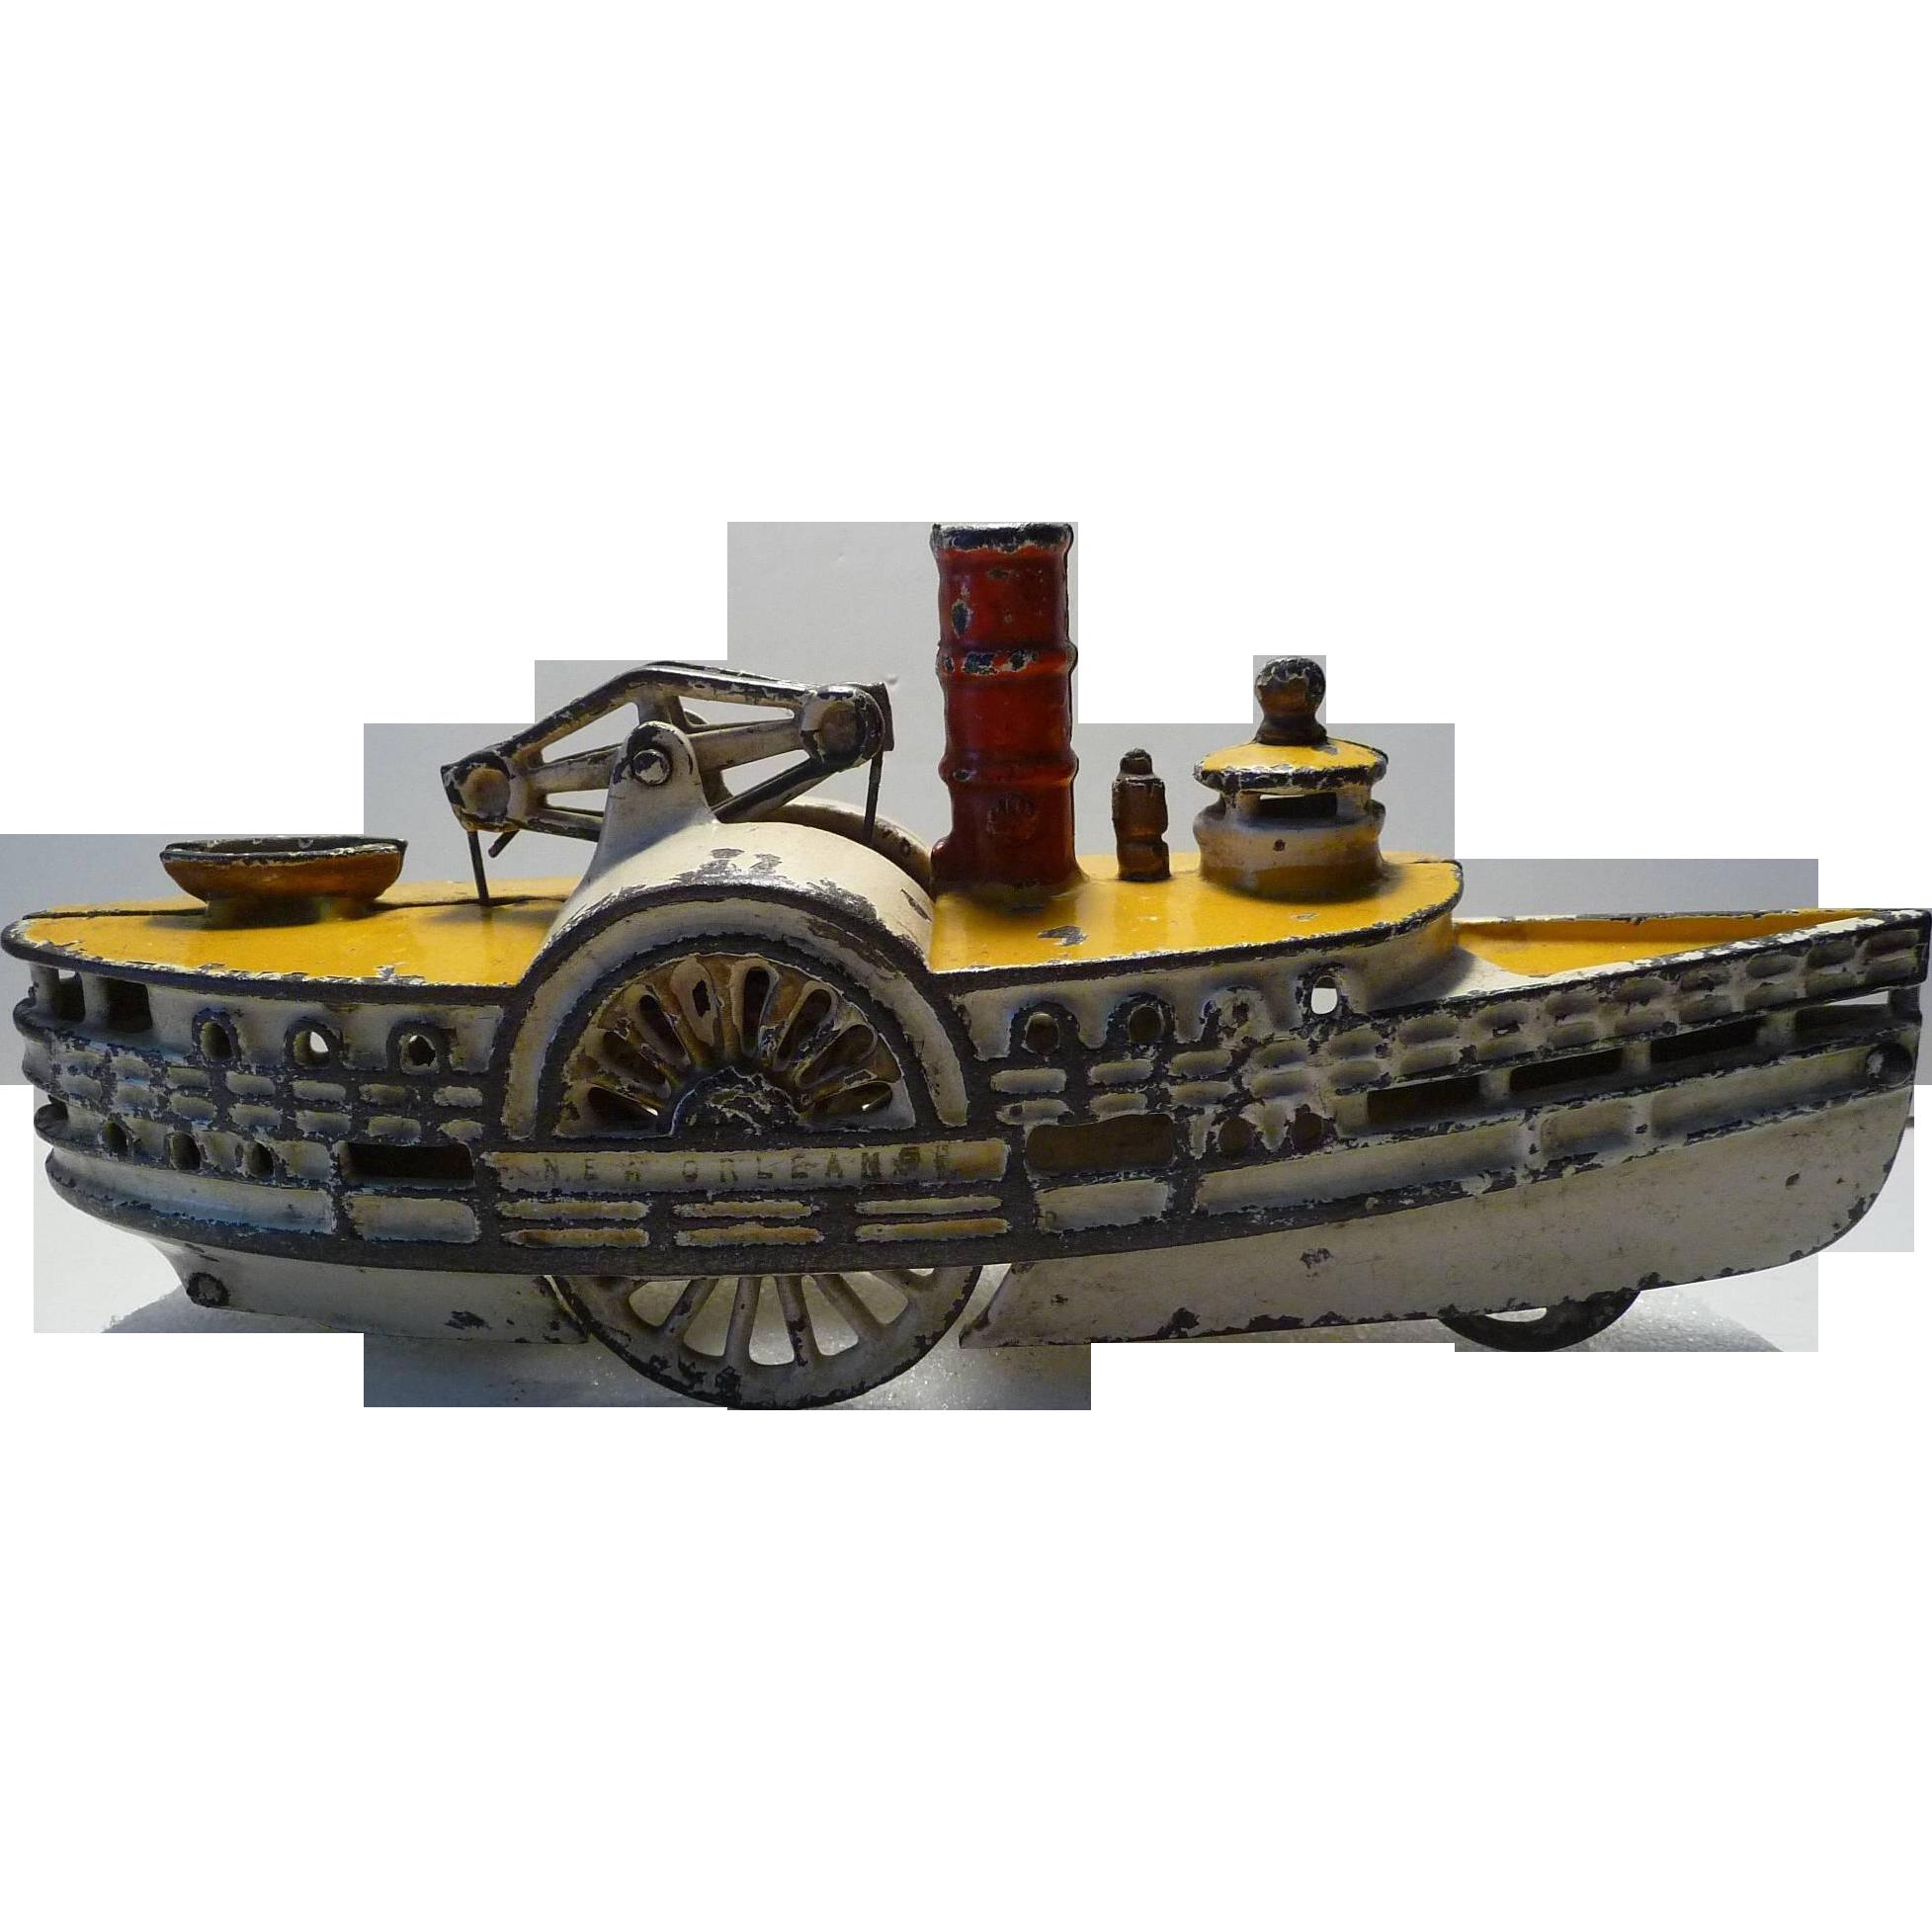 Painted Cast Iron Sidewheel Paddlewheel Steamboat ...